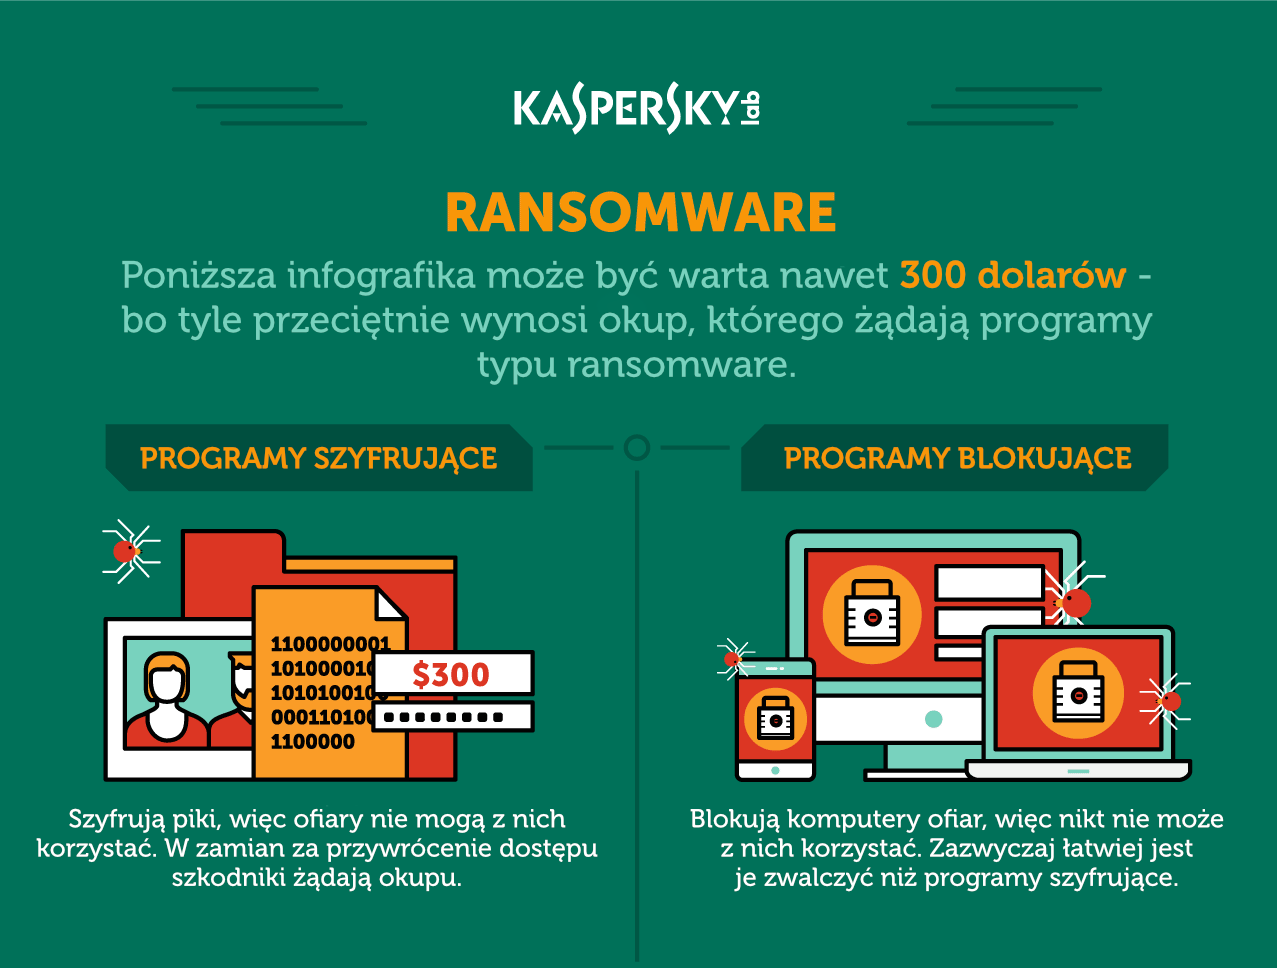 Plansza ransomware